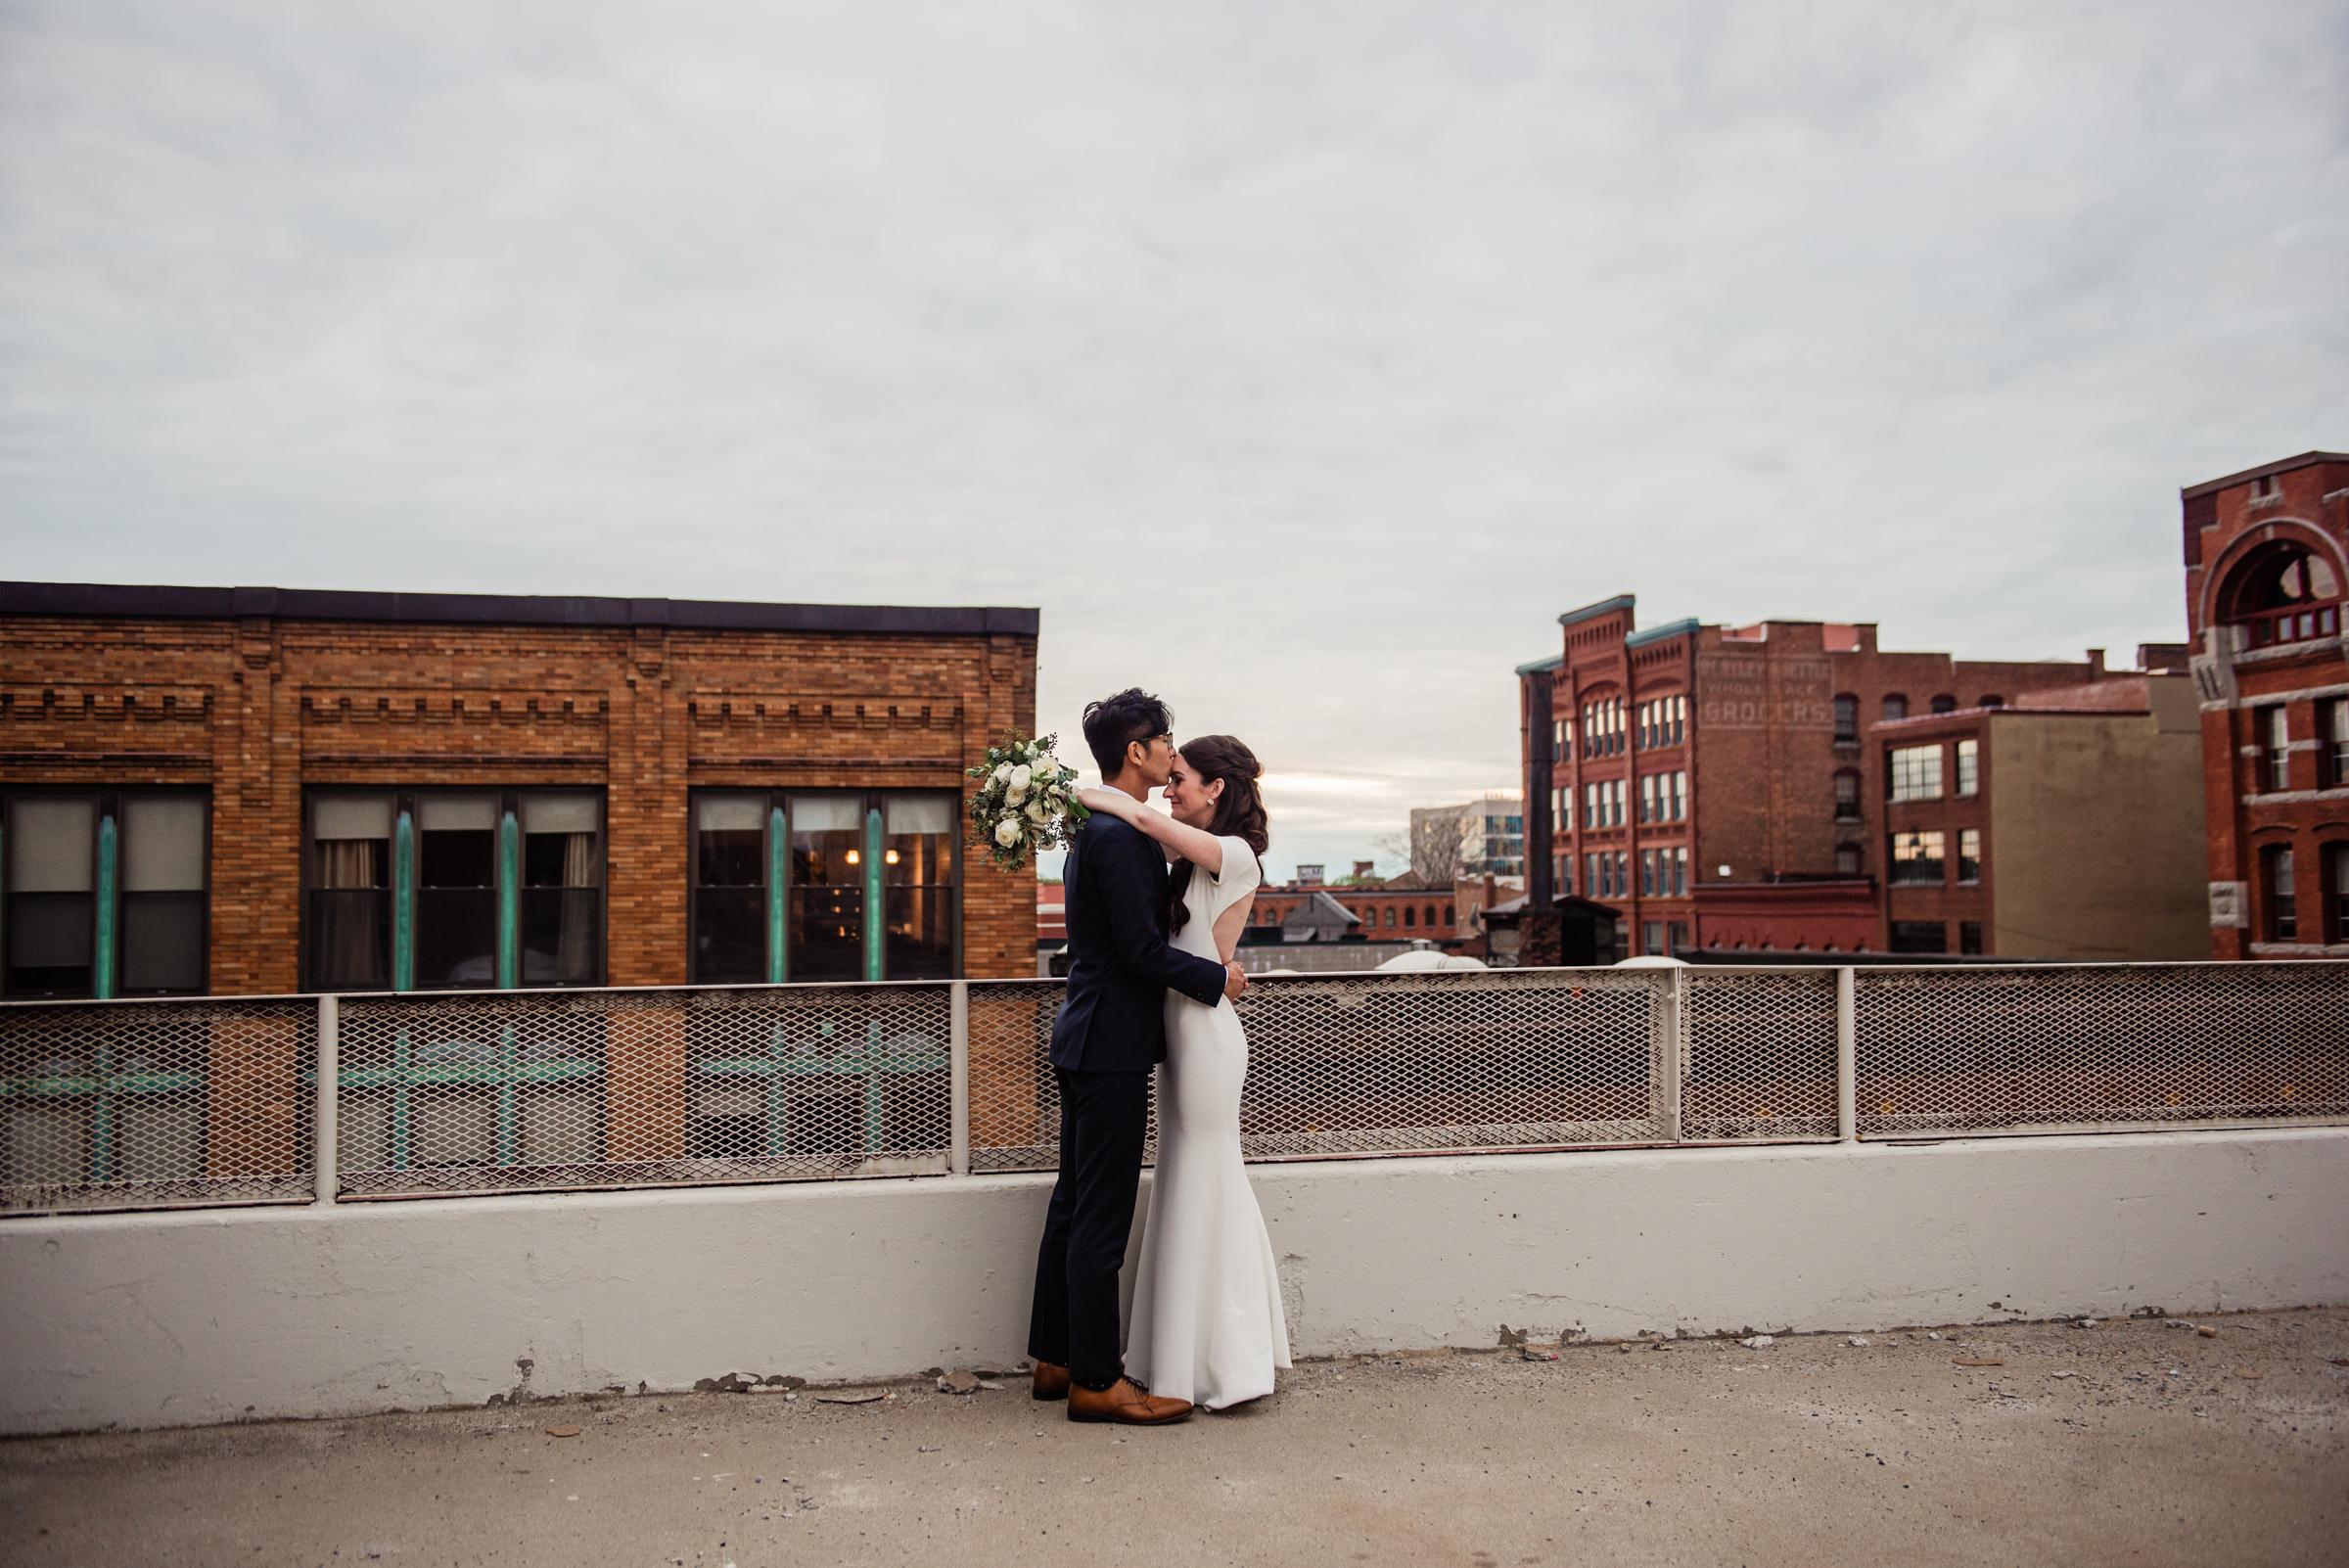 SKY_Armory_Syracuse_Wedding_JILL_STUDIO_Rochester_NY_Photographer_DSC_6251.jpg